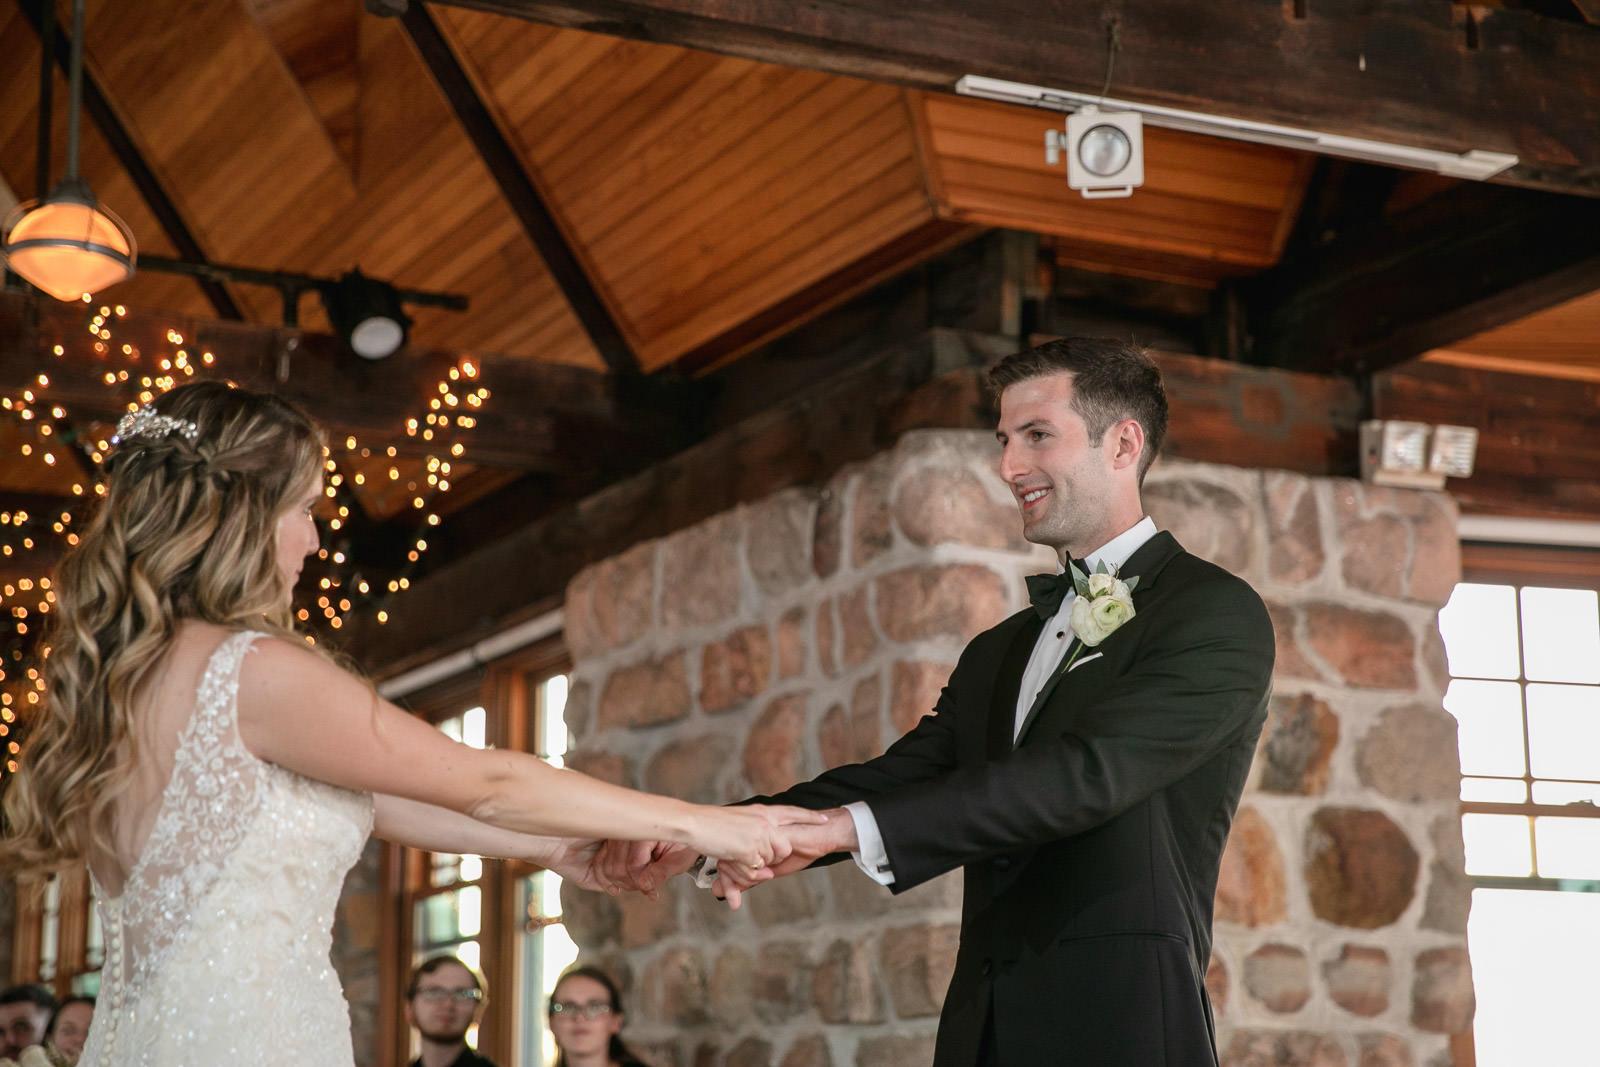 Wedding, Narragansett Towers, The Towers, Narragansett, Rhode Island, RI, Tracy Jenkins photography, RI wedding photographer, Rhode Island wedding photographer, wedding reception, first dance